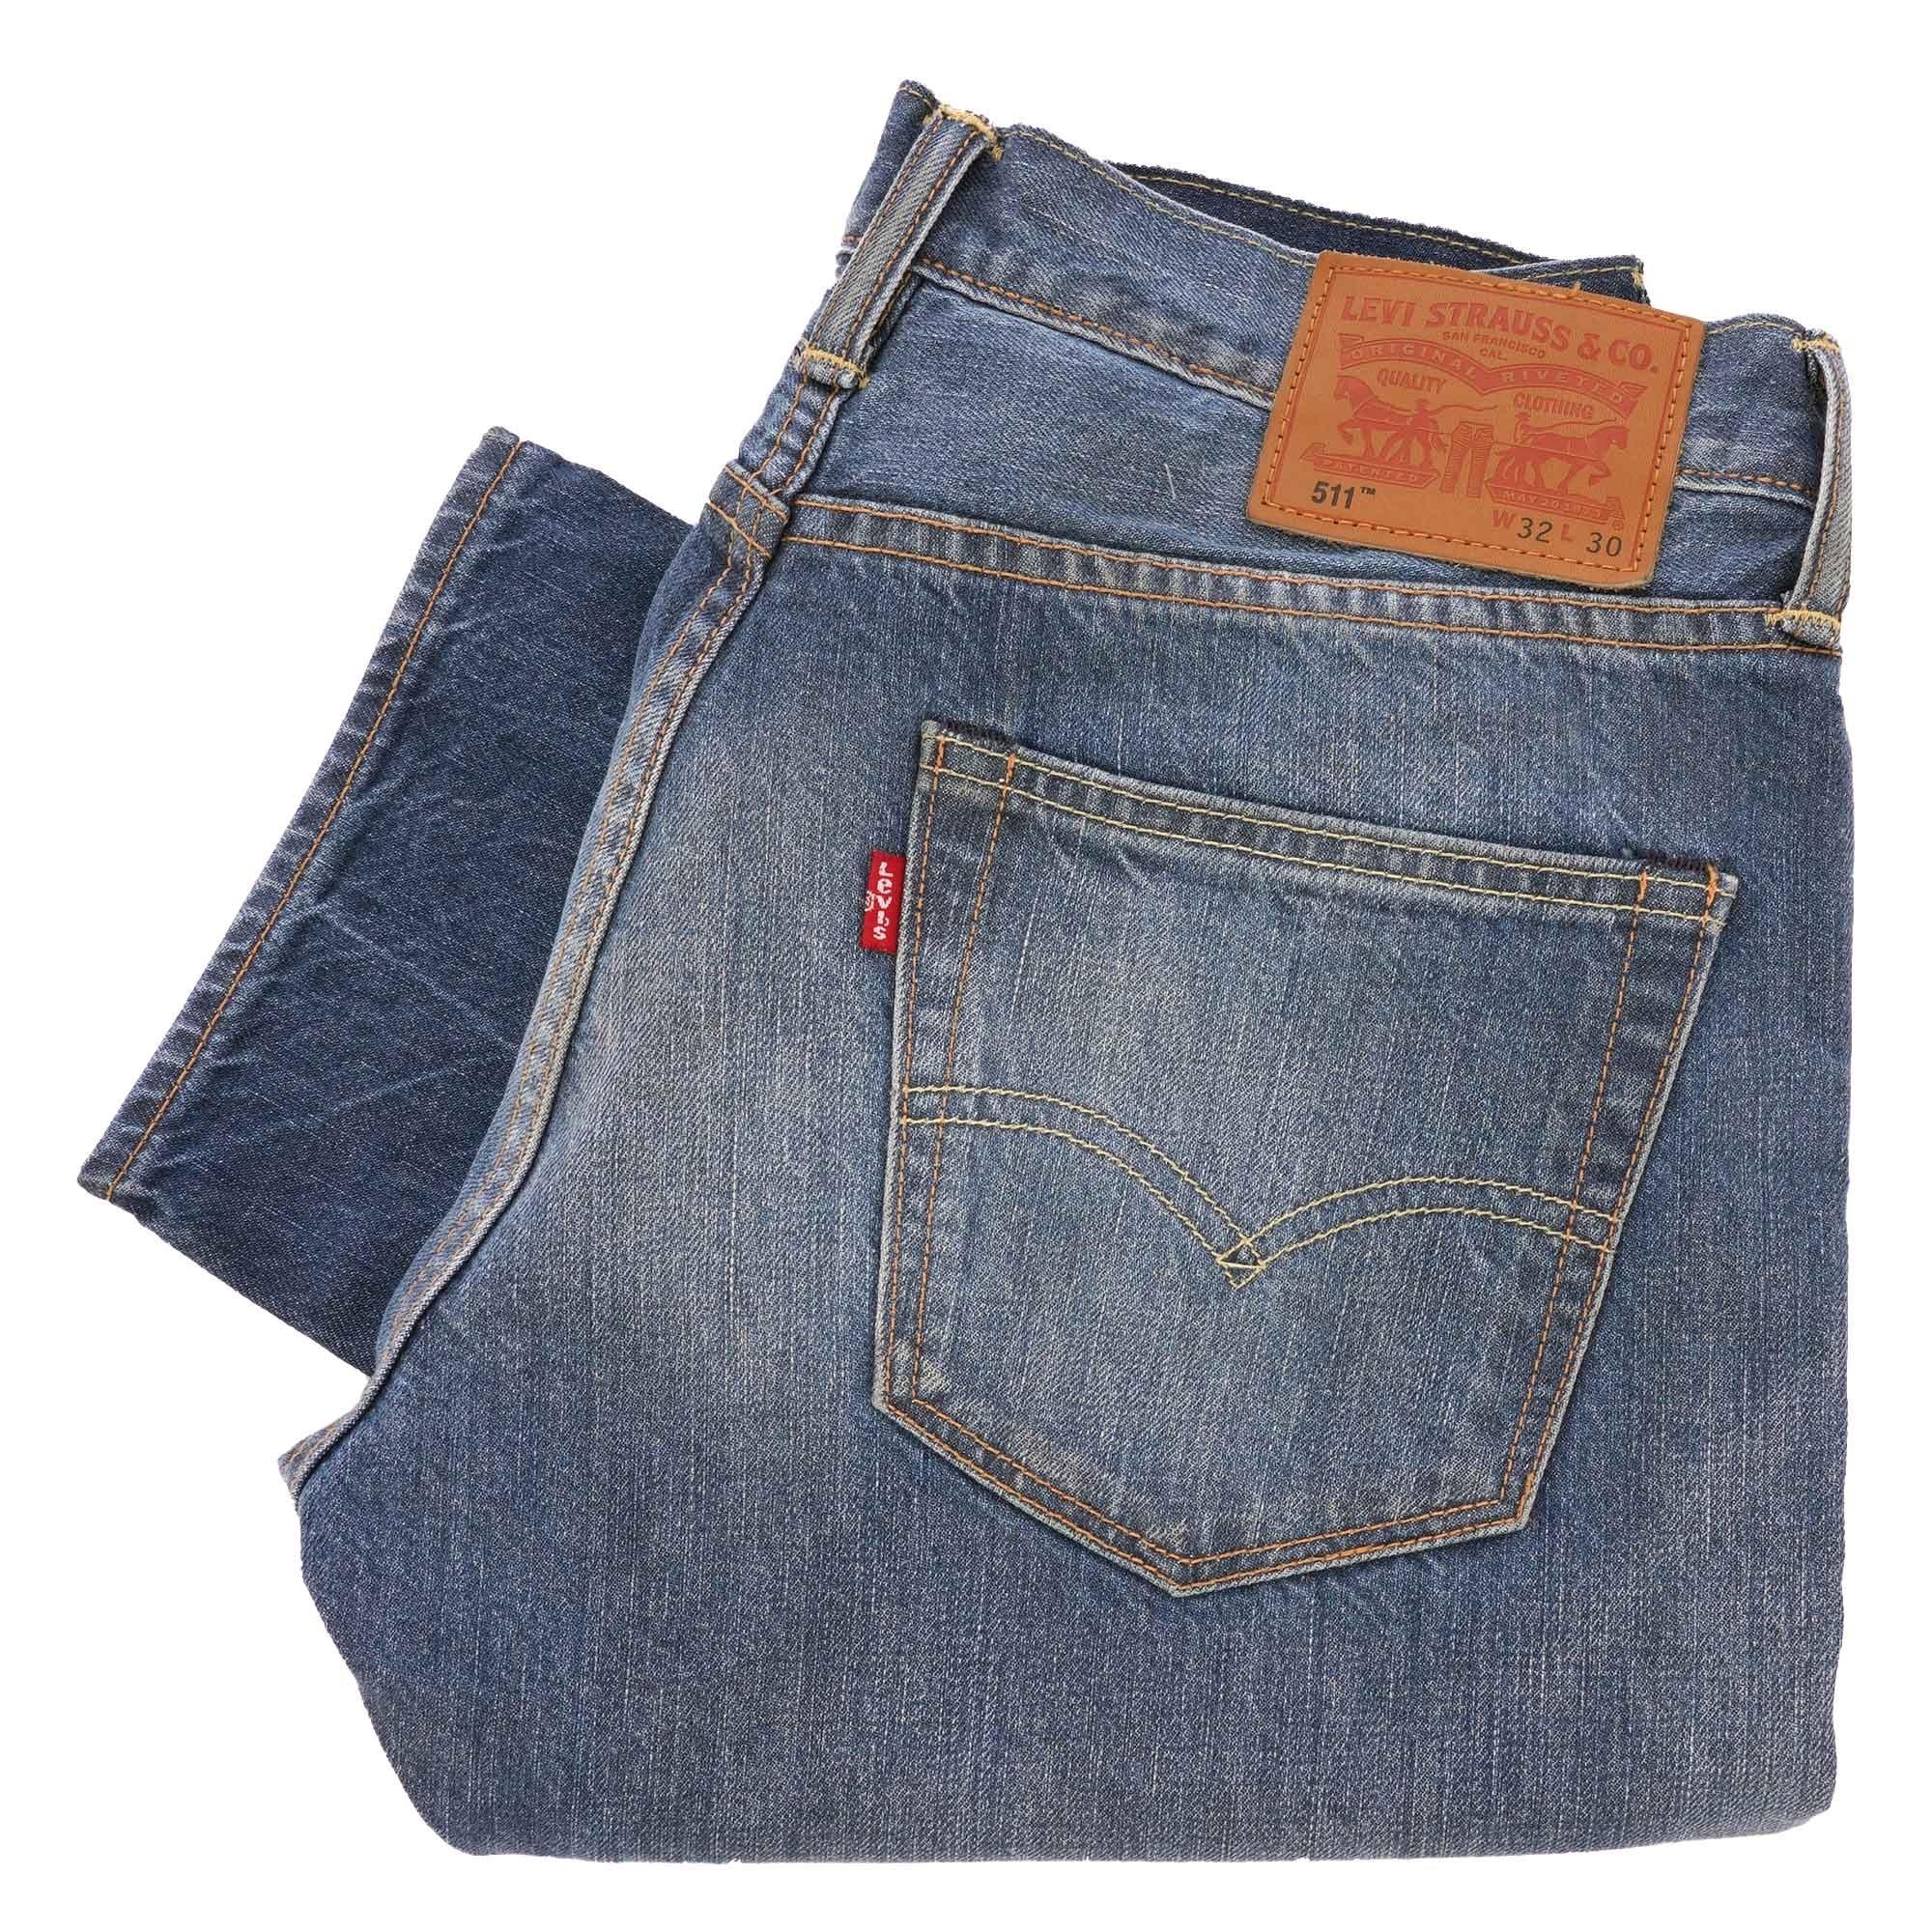 4ed4adeaa2 Levi's 511 Slim Fit Selvedge Jeans | Fender | 04511-2179